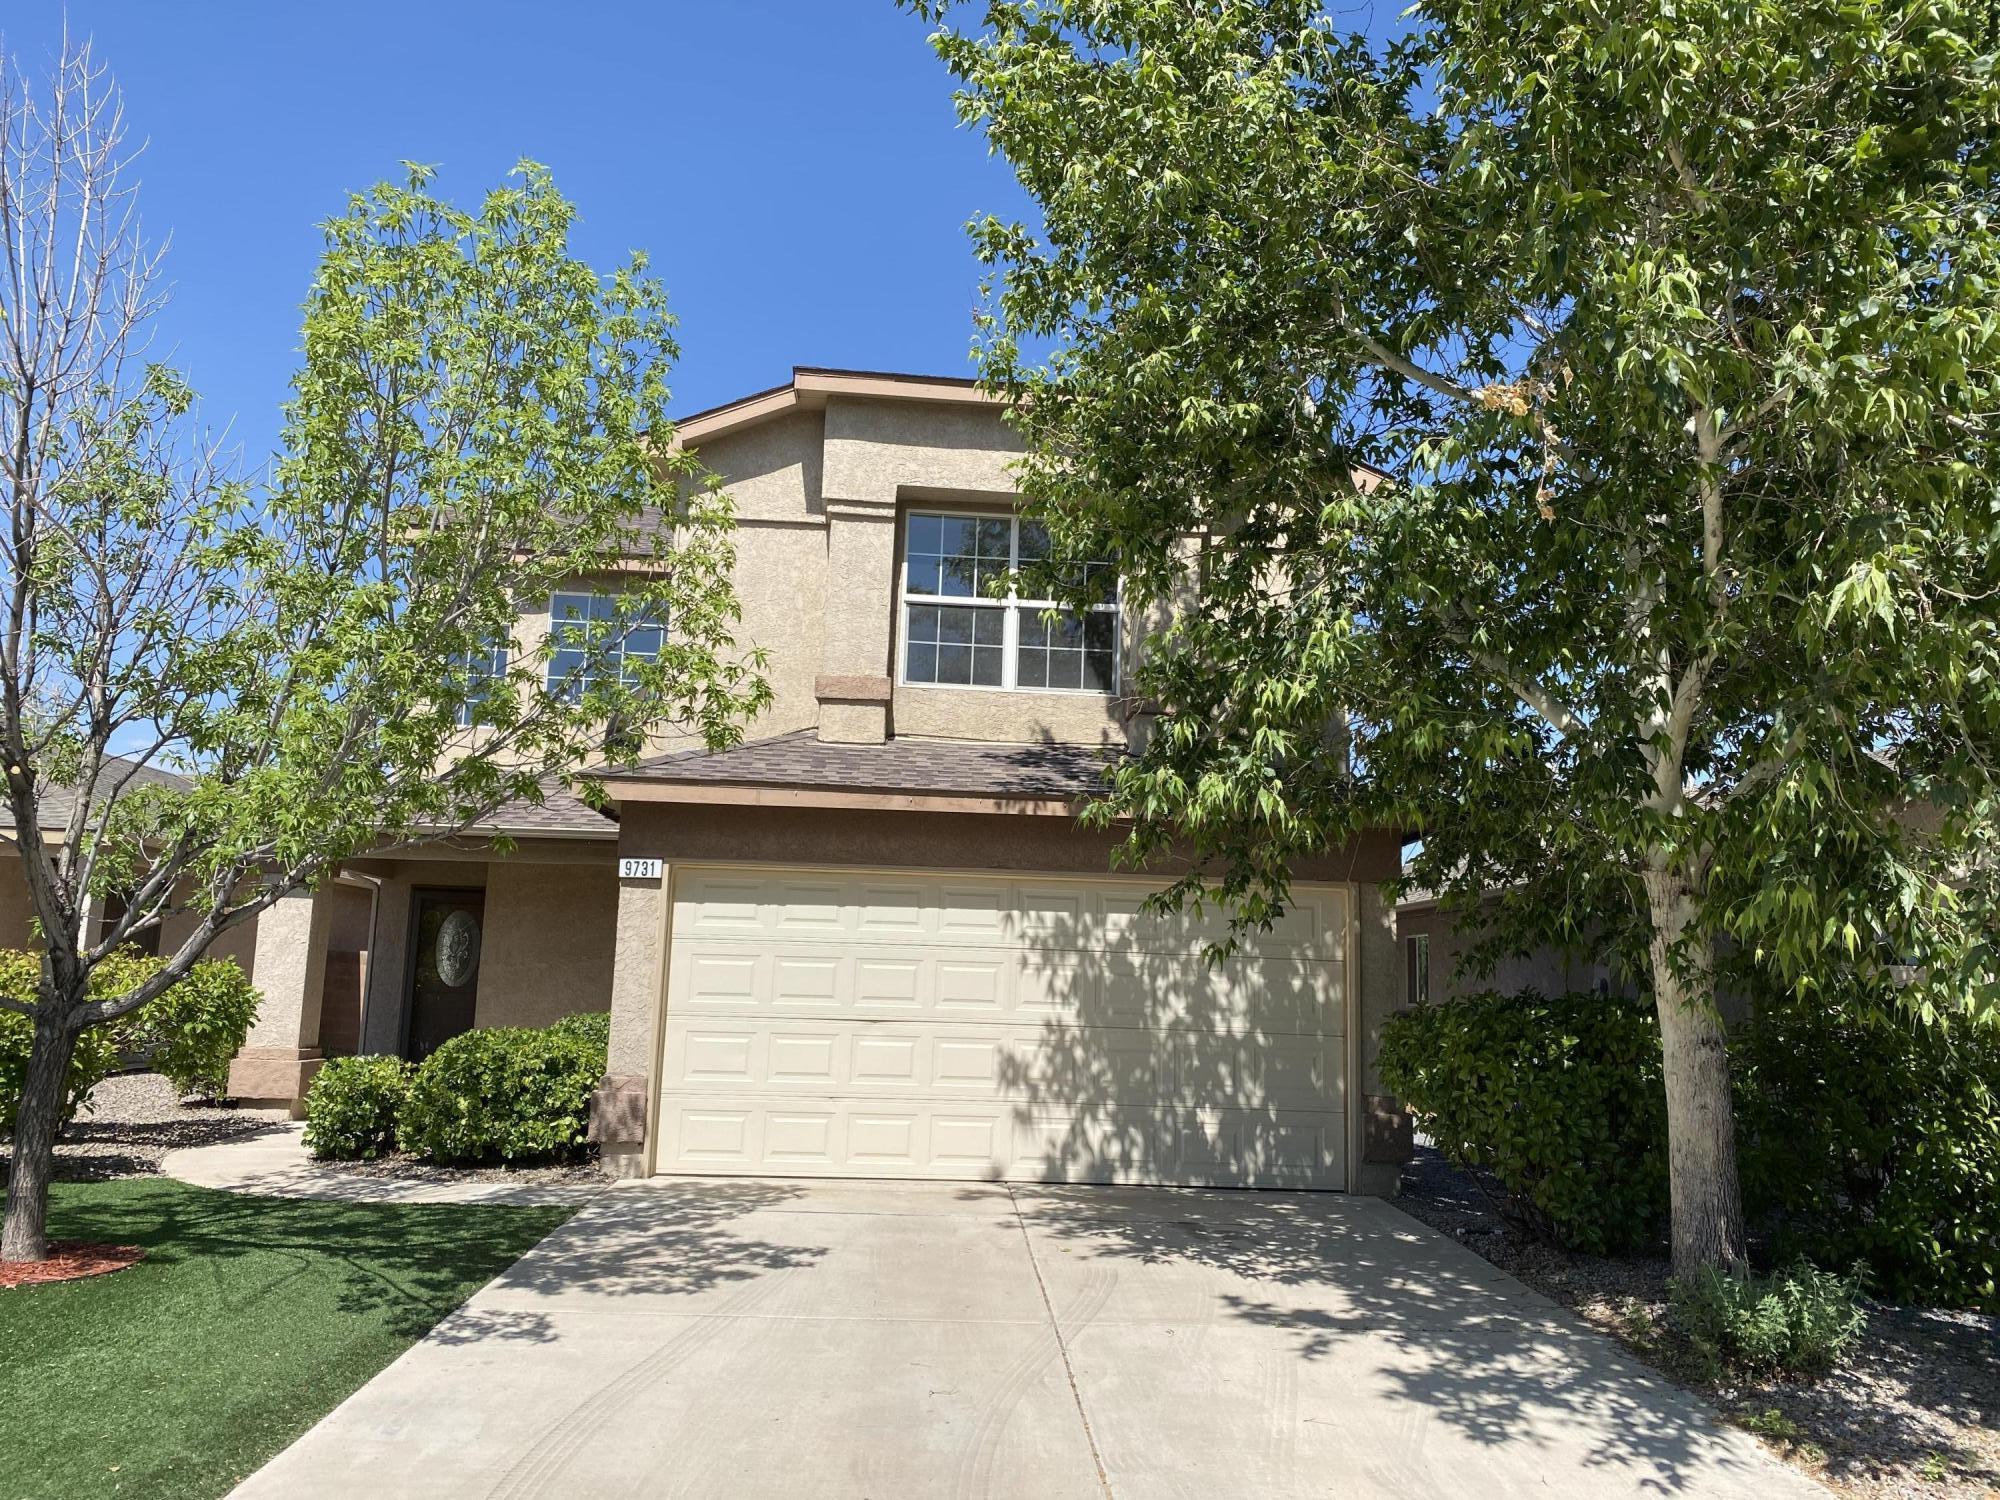 9731 VIVALDI Trail NW Property Photo - Albuquerque, NM real estate listing